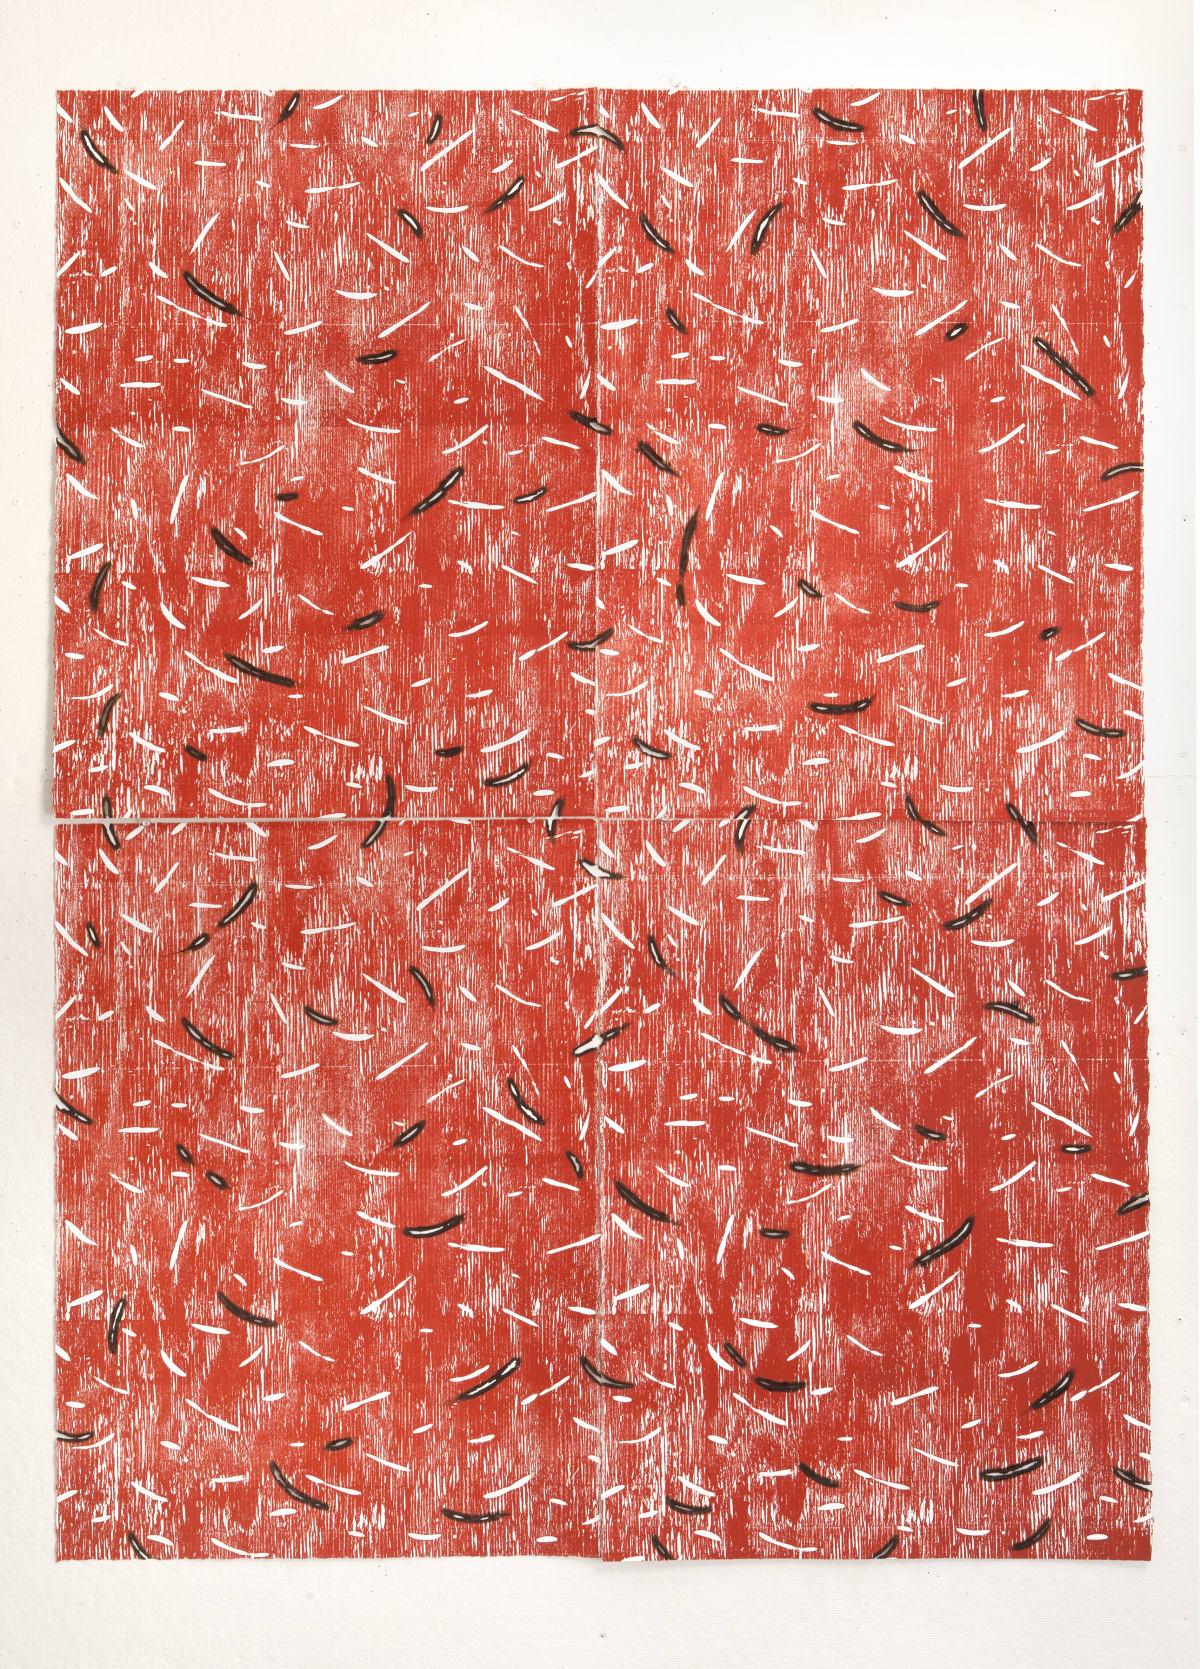 Kathleen Kucka, Heartwood Red, 2019